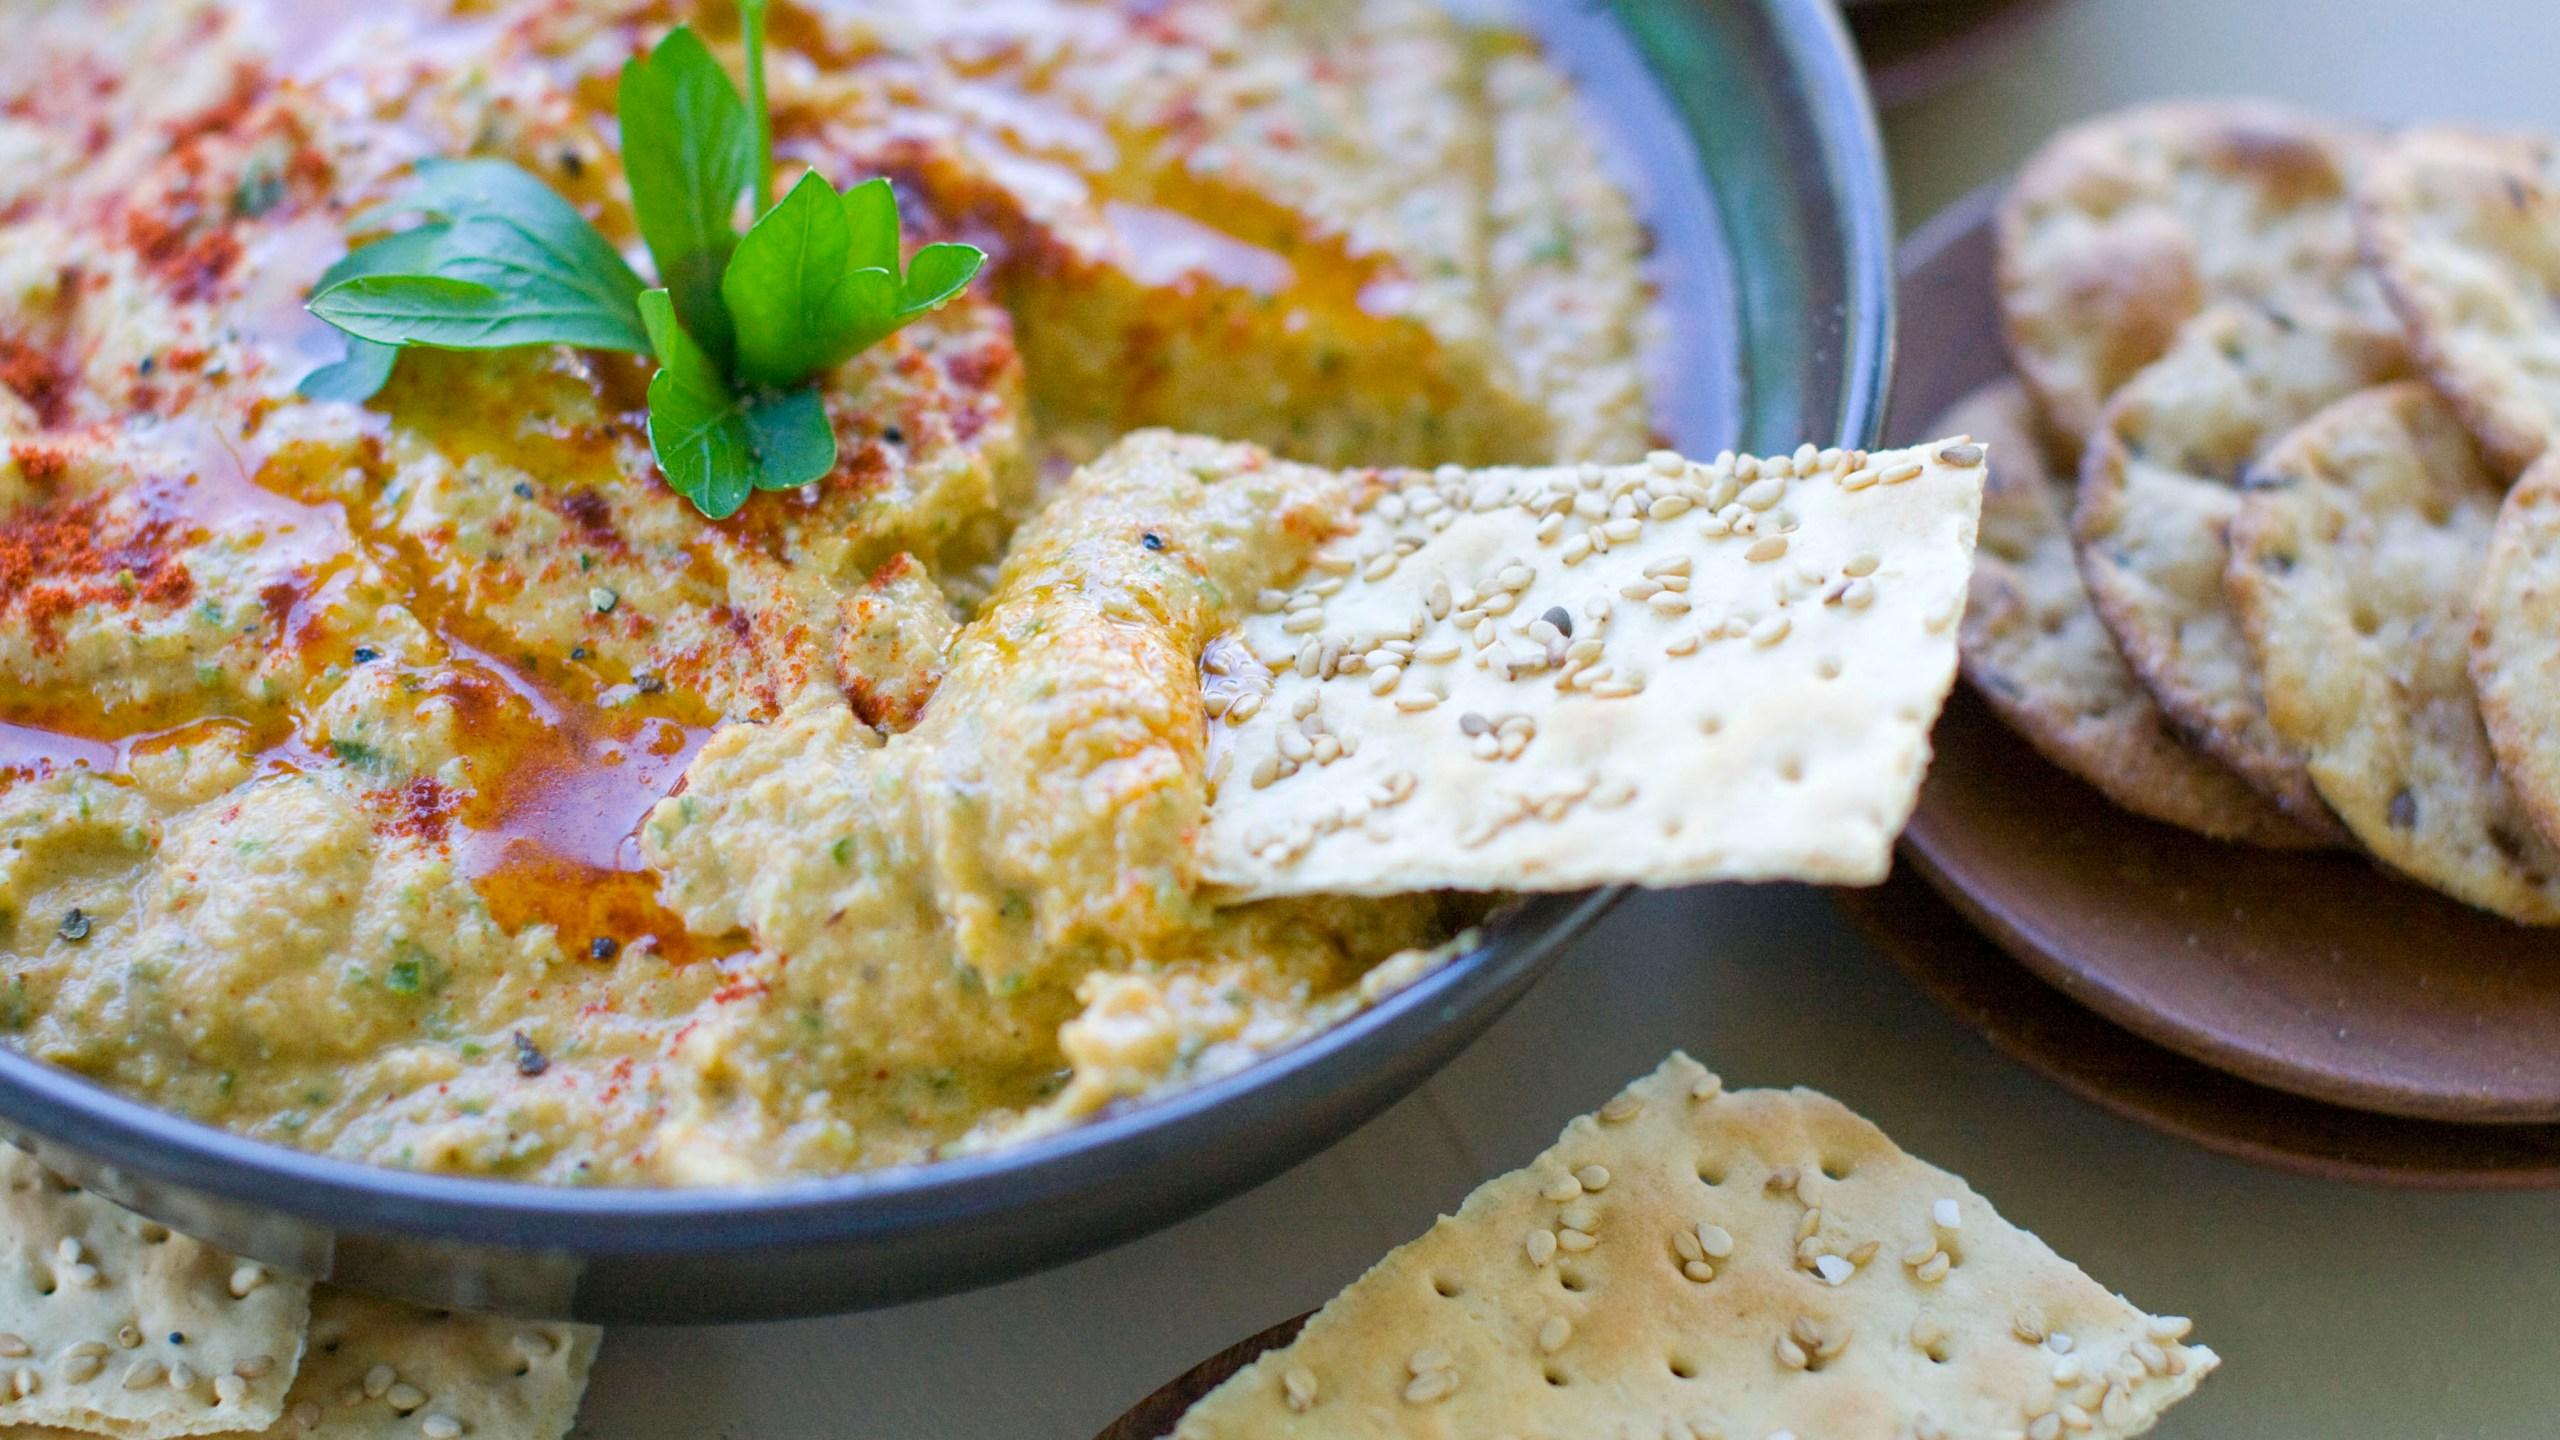 Food-Deadline-Zucchini Hummus_1532955715788